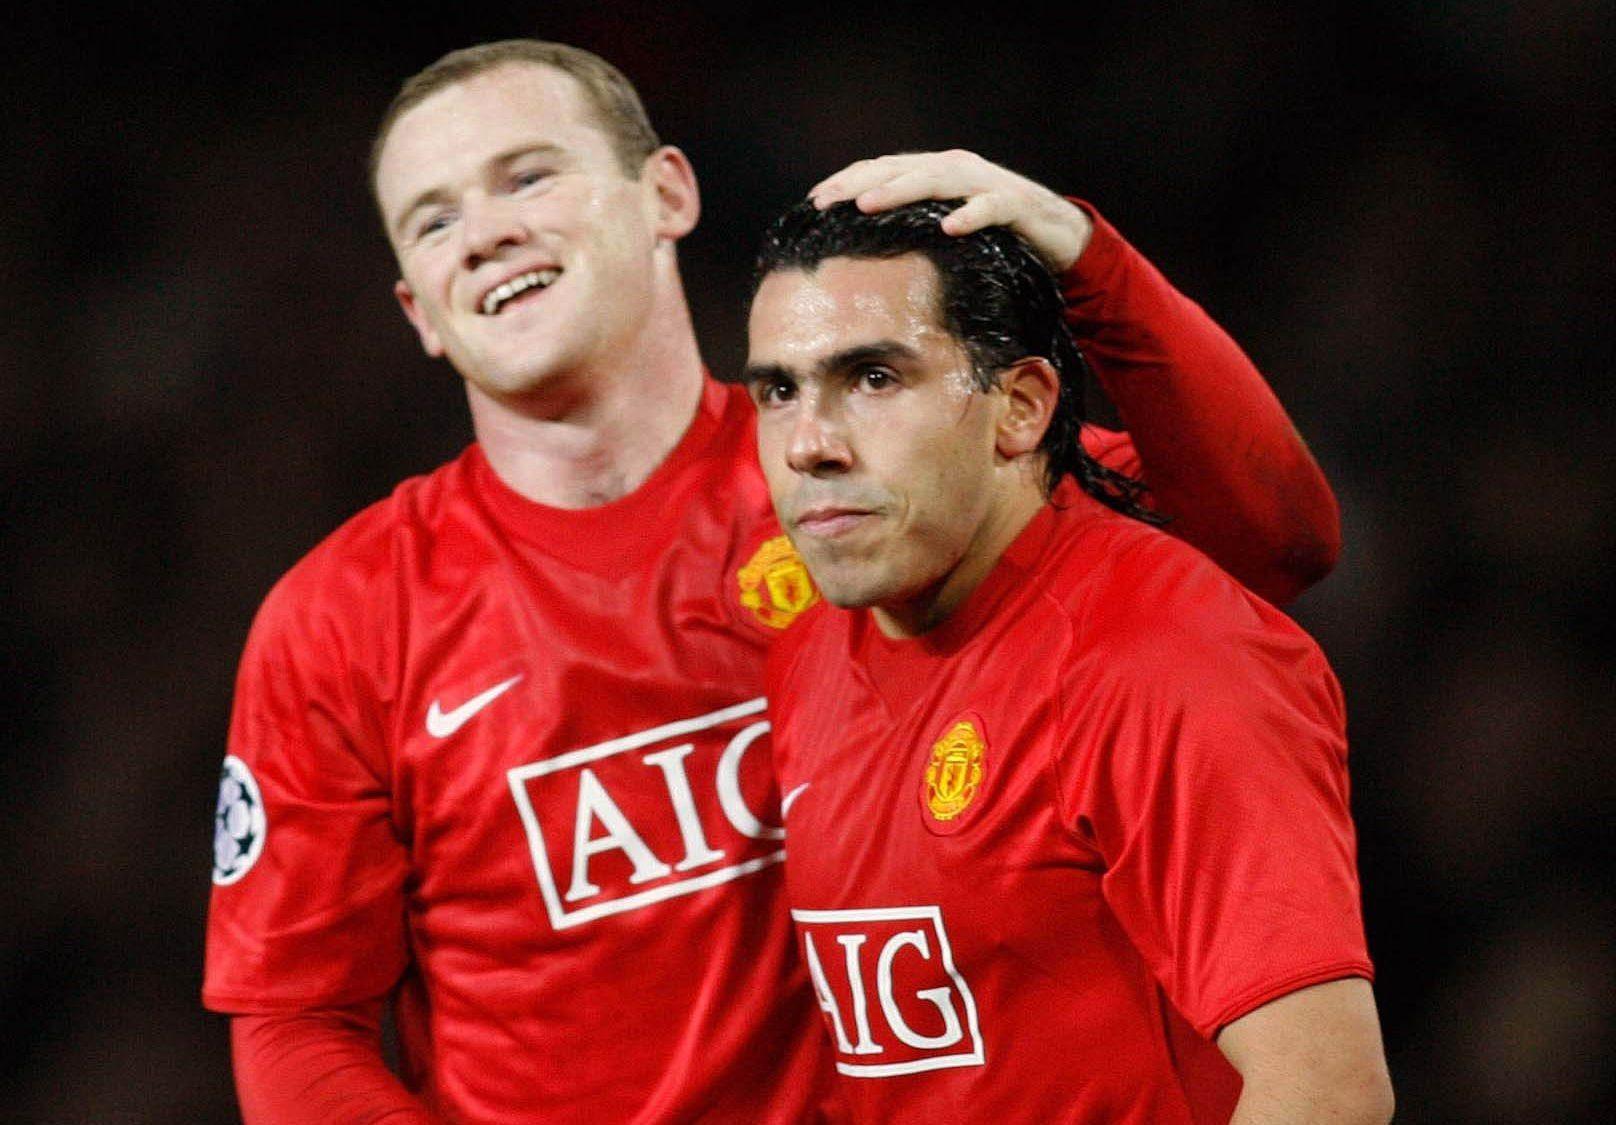 Carlos Tevez reveals Wayne Rooney lent him a Lamborghini after he showed up to training in an Audi  - Bóng Đá